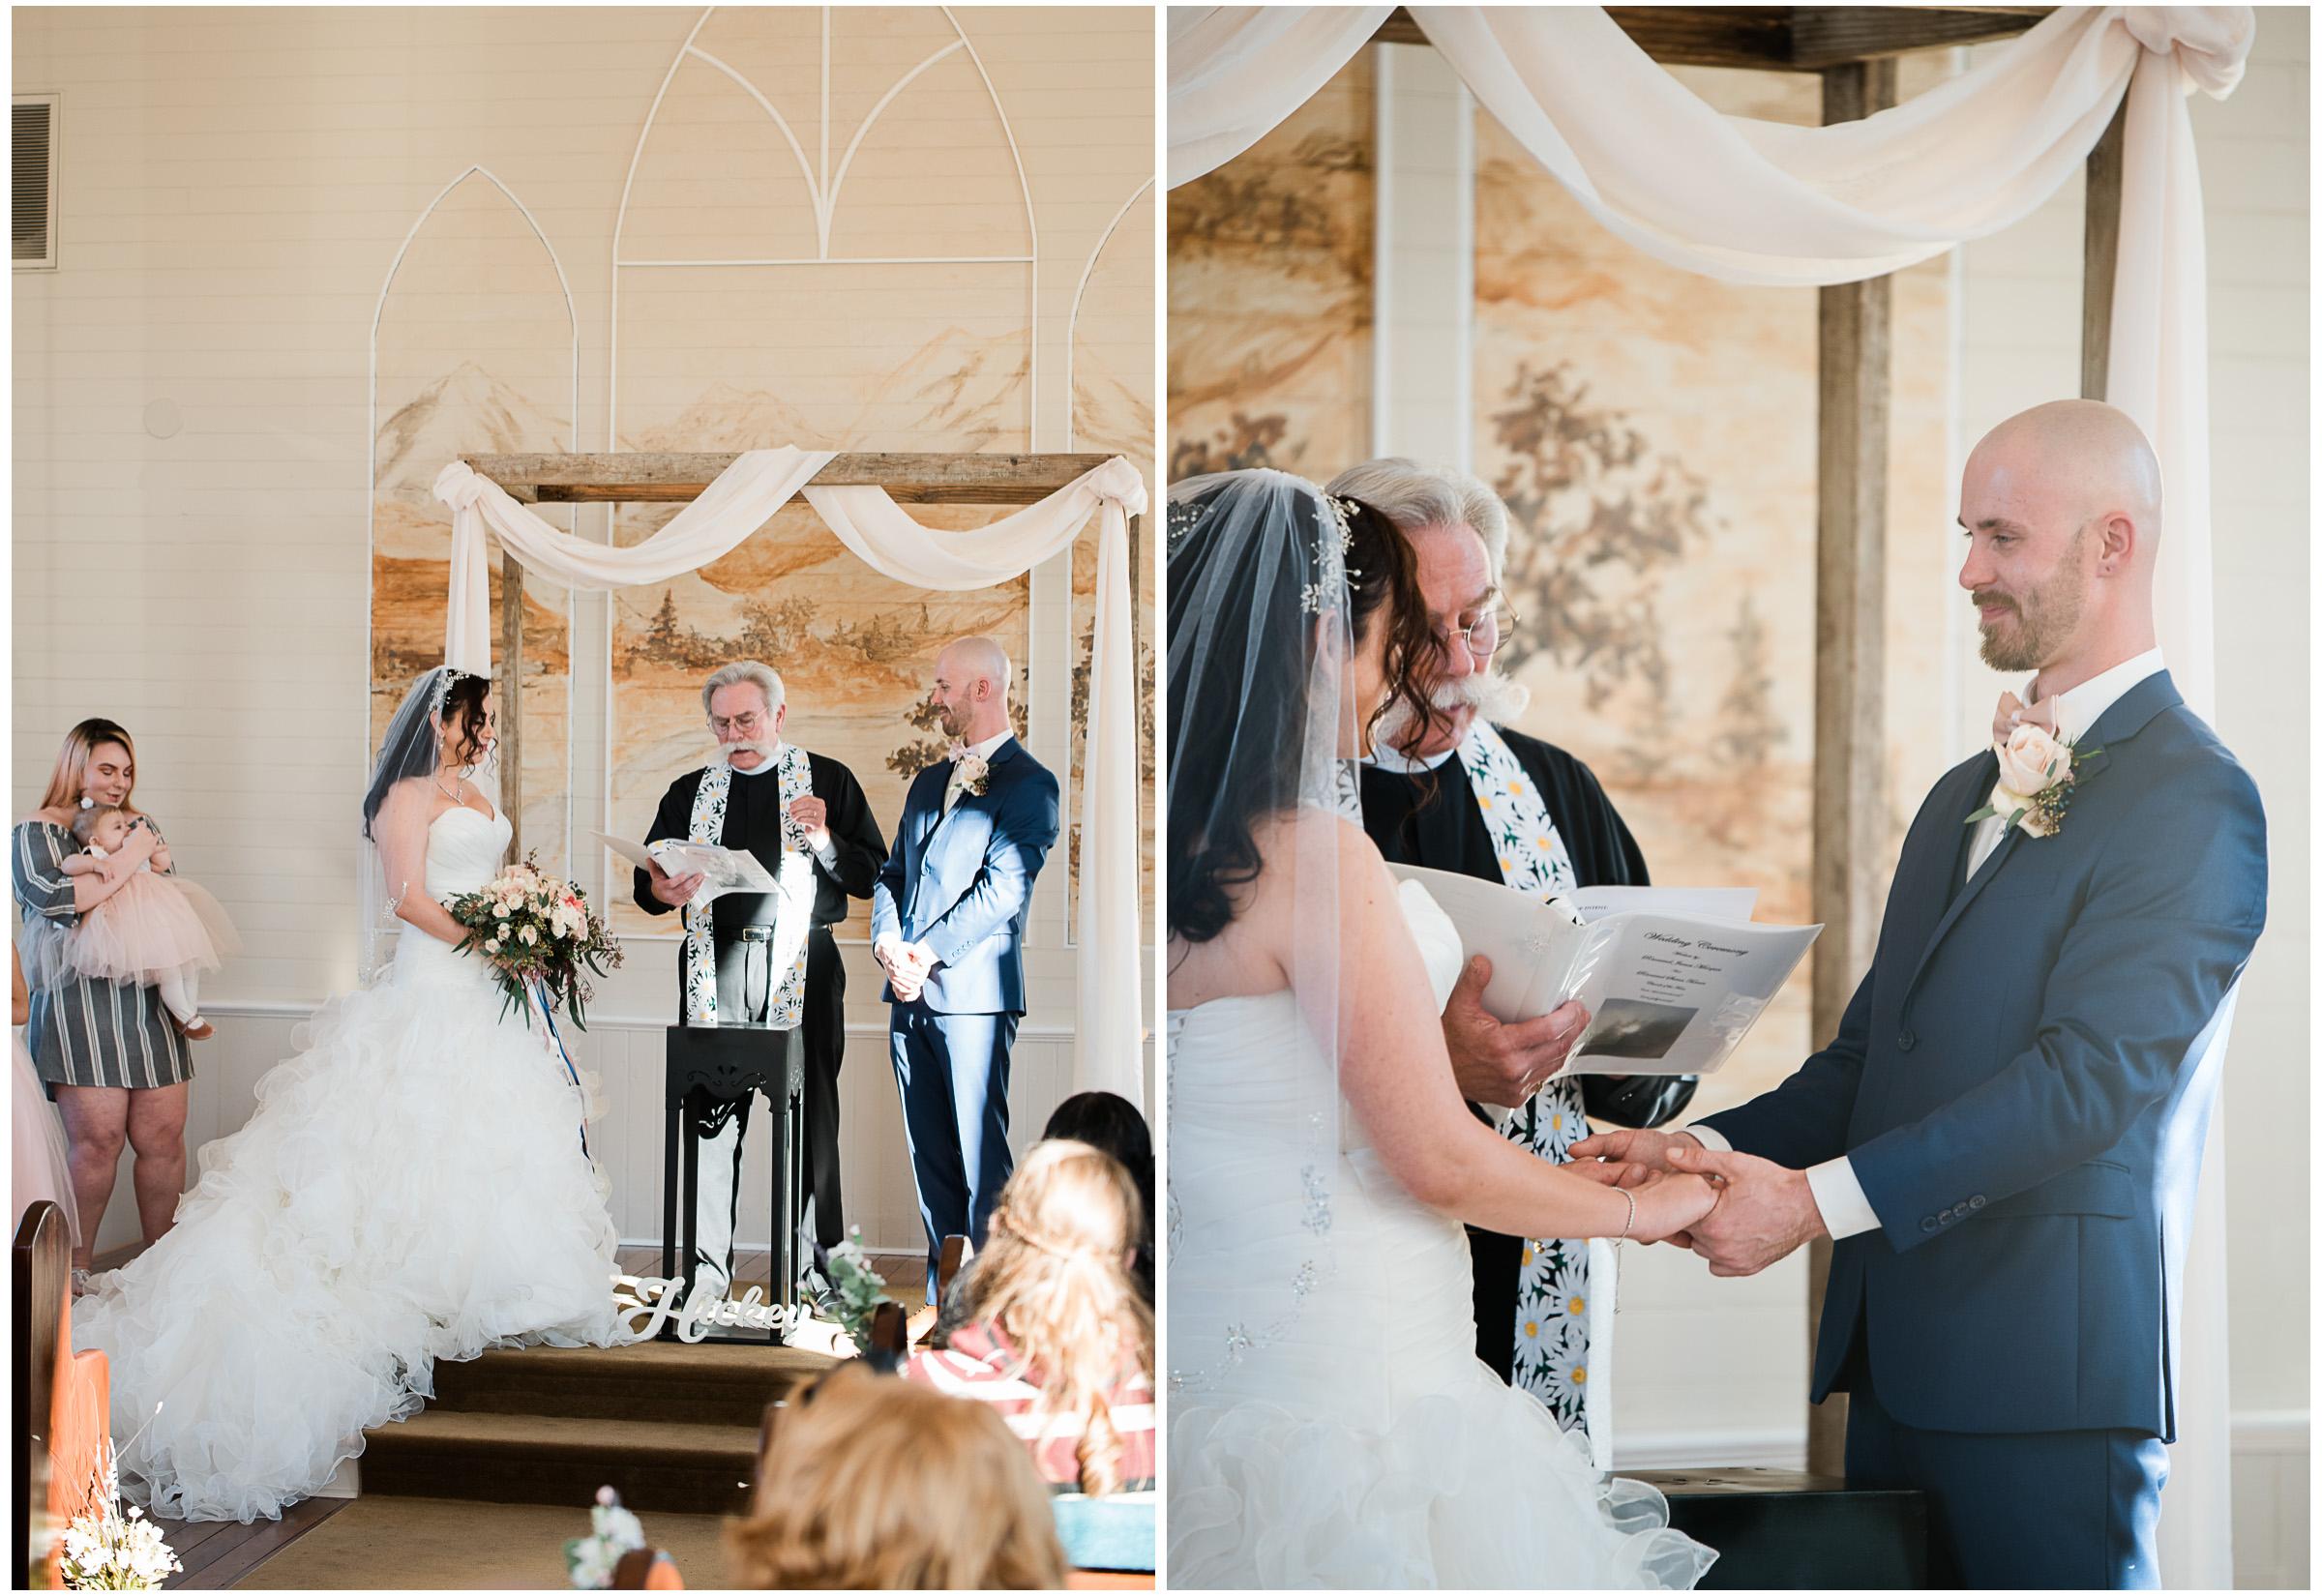 Sacramento Wedding - Sacramento Photographer - Justin Wilcox Photography - 12.jpg